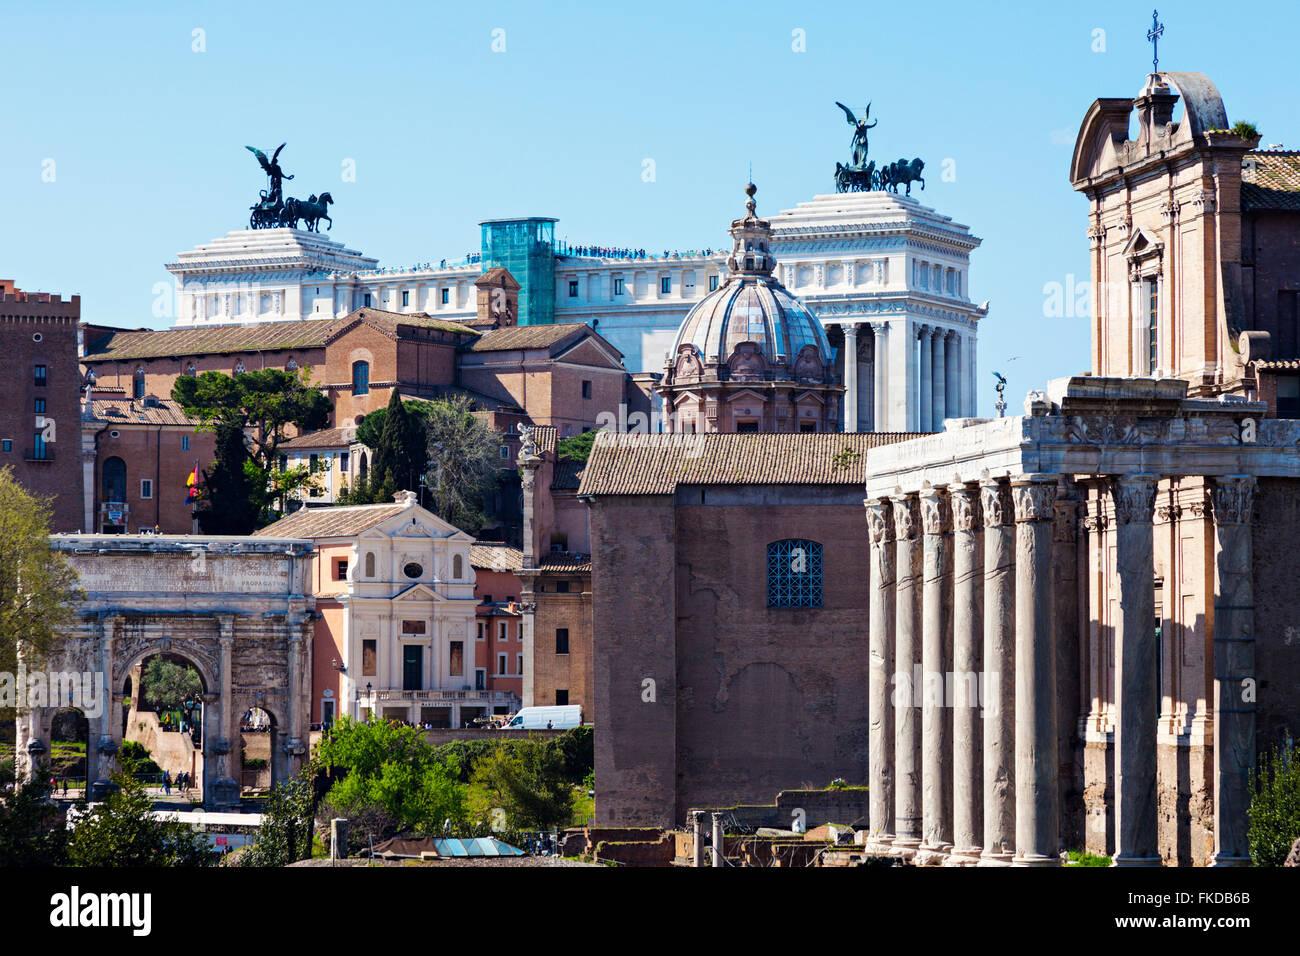 Roman Forum and Monument of Vittorio Emanuele II against blue sky - Stock Image